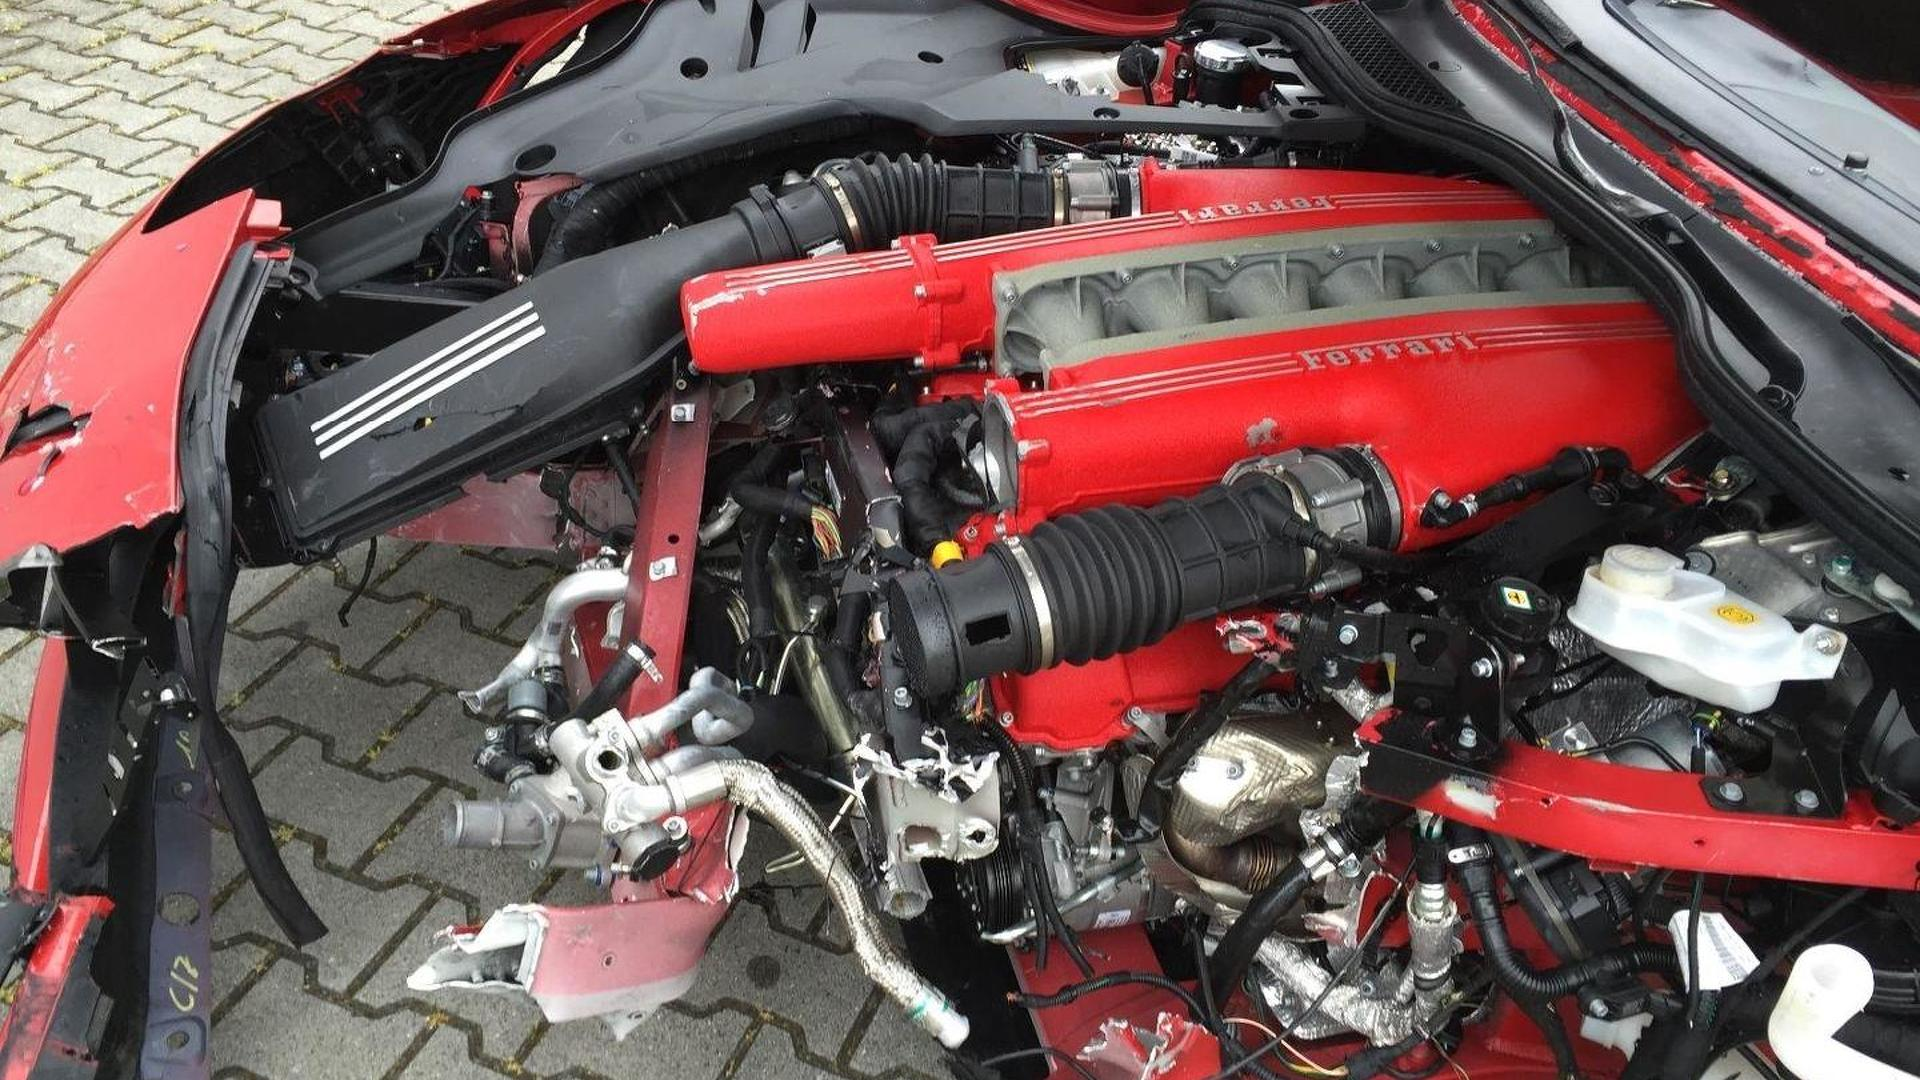 Heavily Crashed Ferrari F12 Berlinetta Is A 77 000 Pile Of Junk